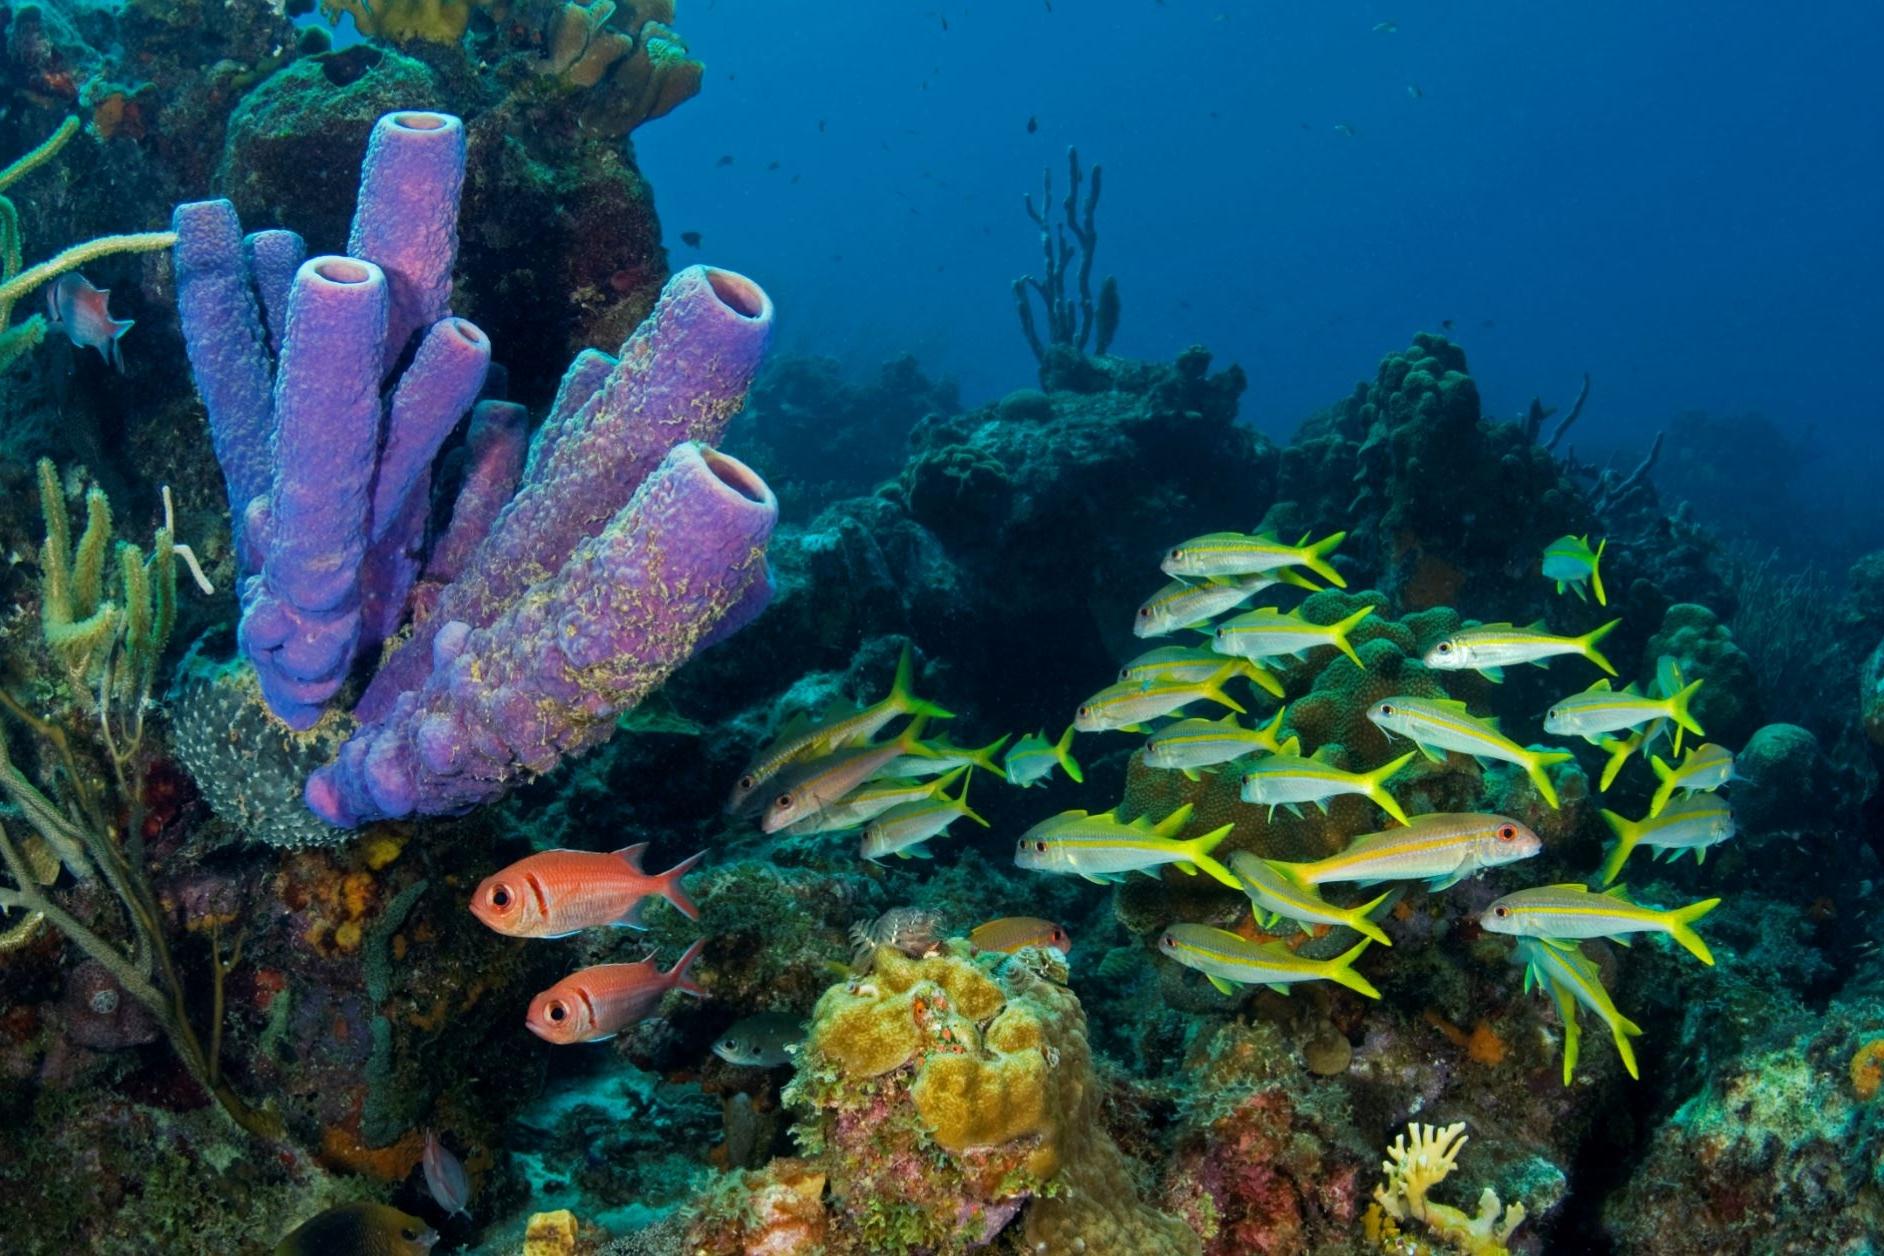 the maldives, may 2016 CREDIT: the ocean agency/ coral reef image bank